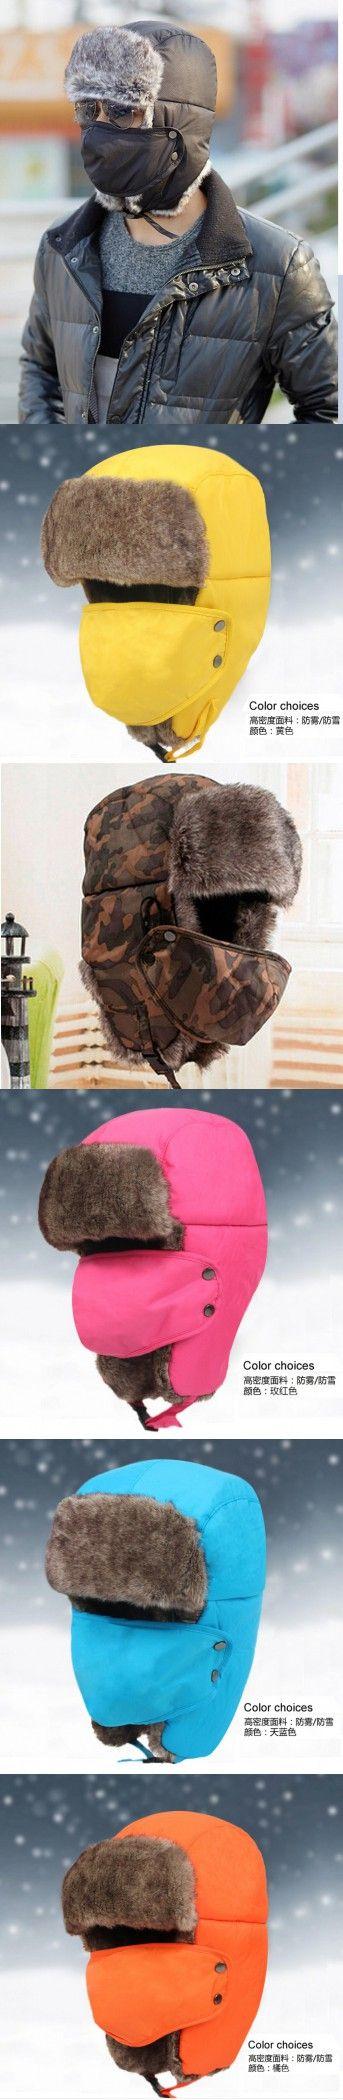 2015 new arrival fashion ushanka russian hat Bomber fur winter hats sports snow outdoor aviator ear flaps cap for men&women A88 $17.76